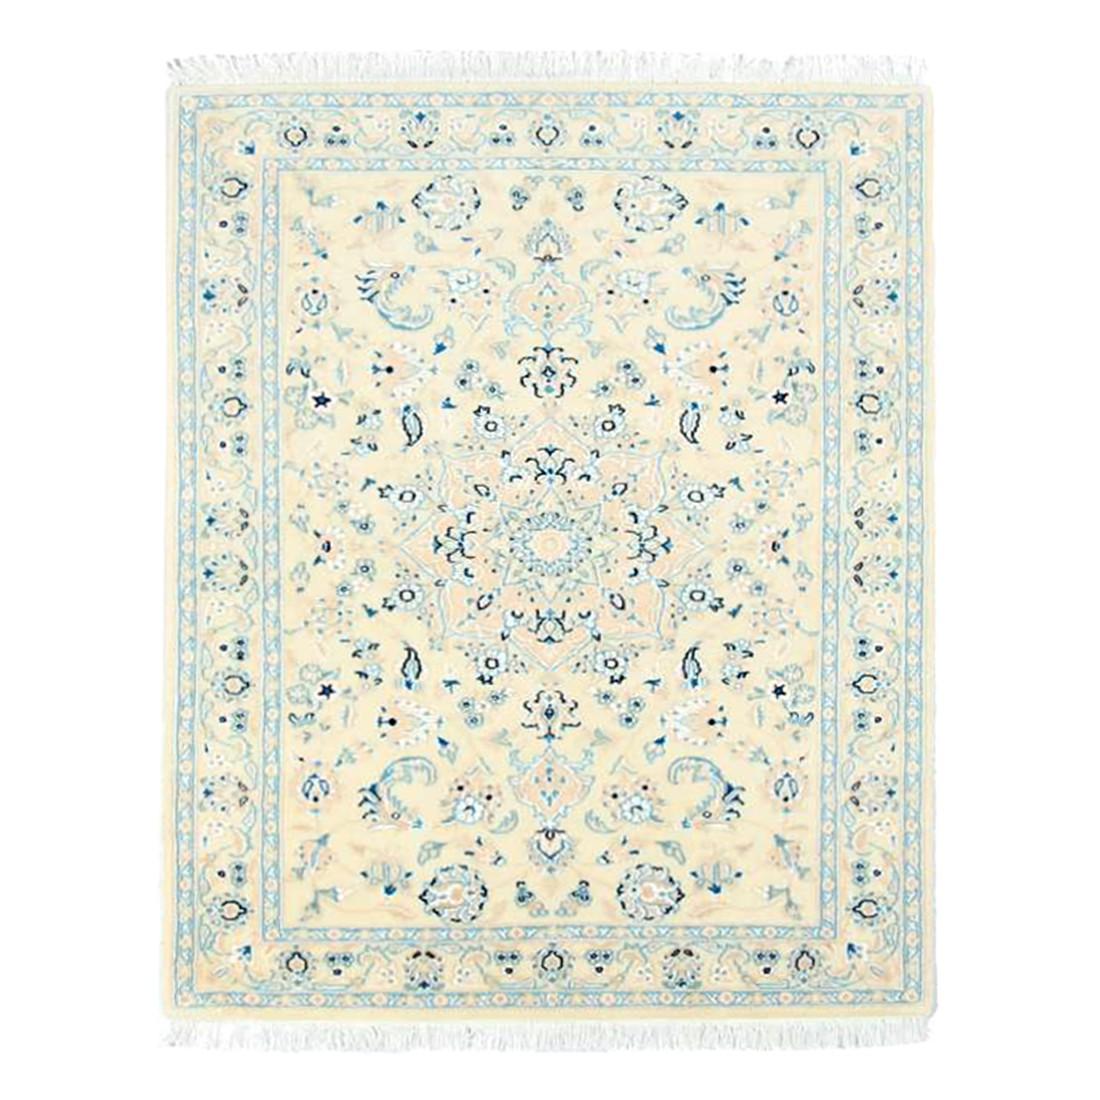 Teppich Nain Scherkat Royal - Beige - 120 x 200 cm, Parwis